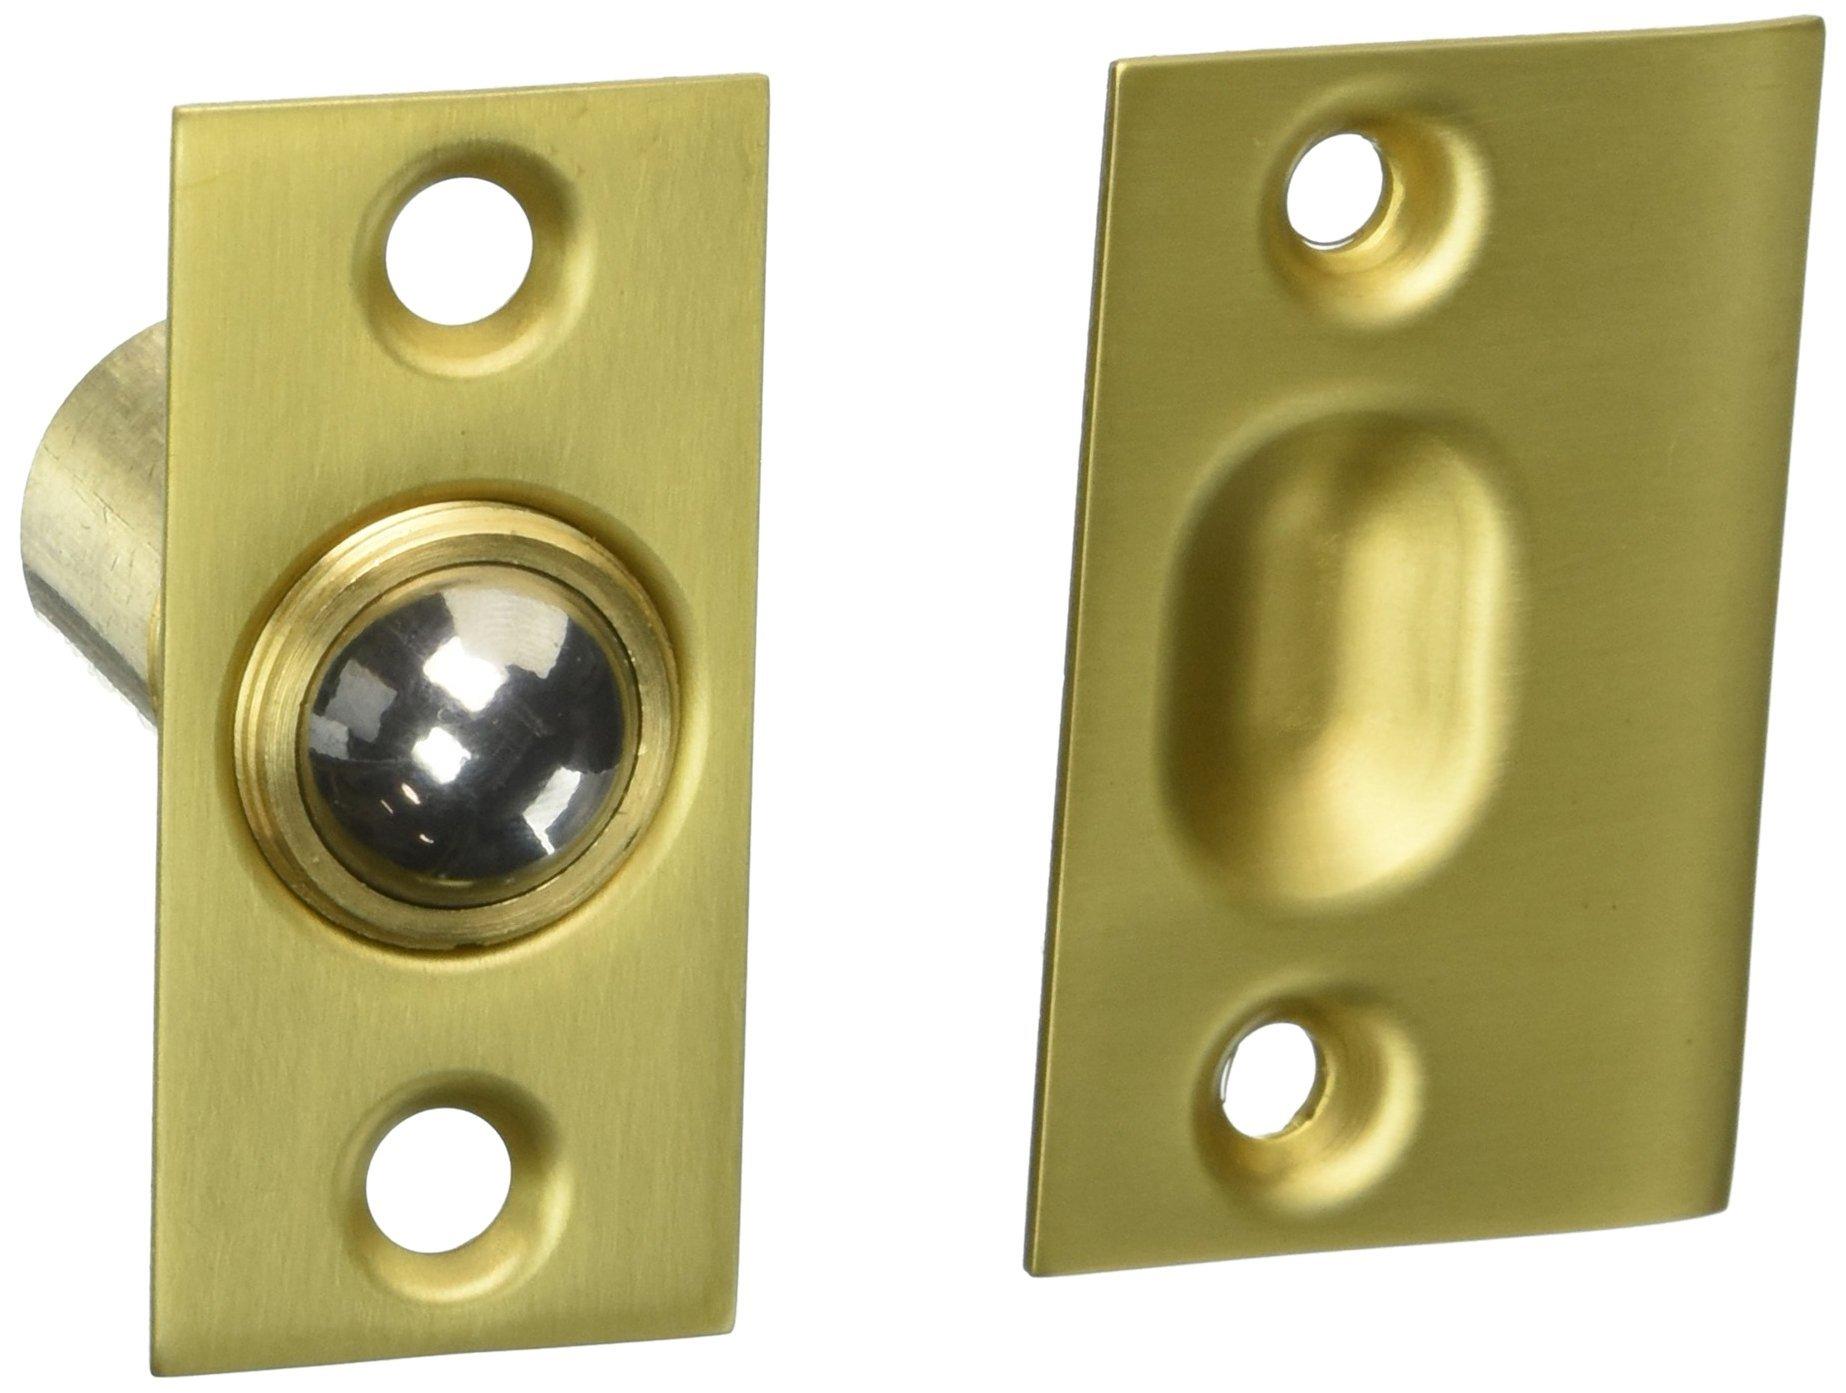 Baldwin 0426034 Adjustable Ball Catch, Unlacquered Vintage Brass